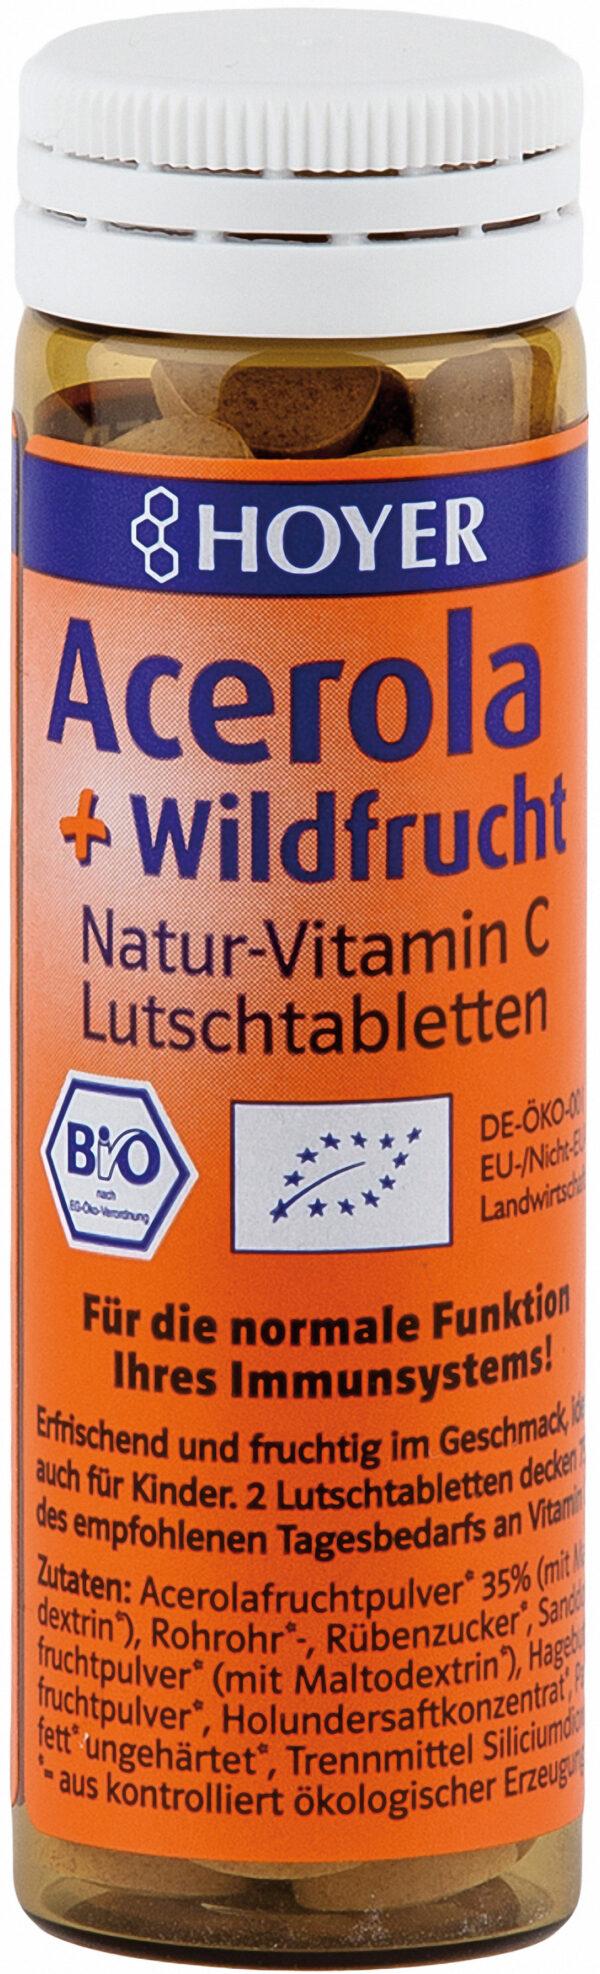 HOYER Acerola + Wildfrucht Lutschtabletten Nahrungsergänzungsmittel 8x30g